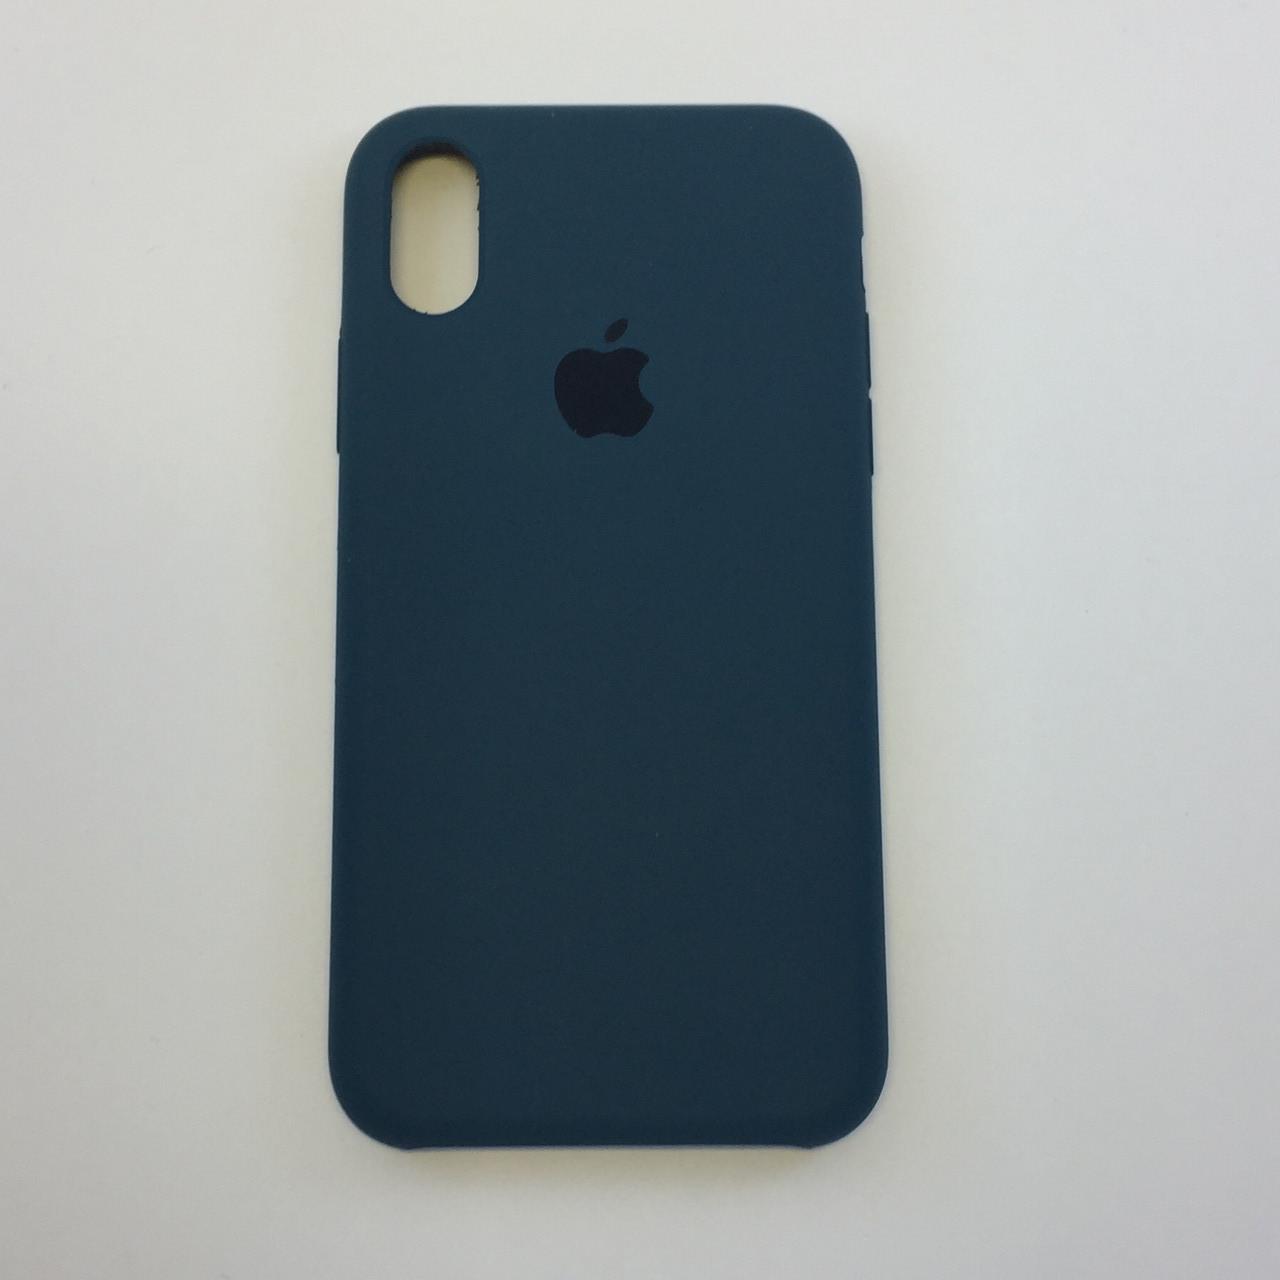 "Чехол - Silicon Case для iPhone ""Мистический - №35"" - copy orig."